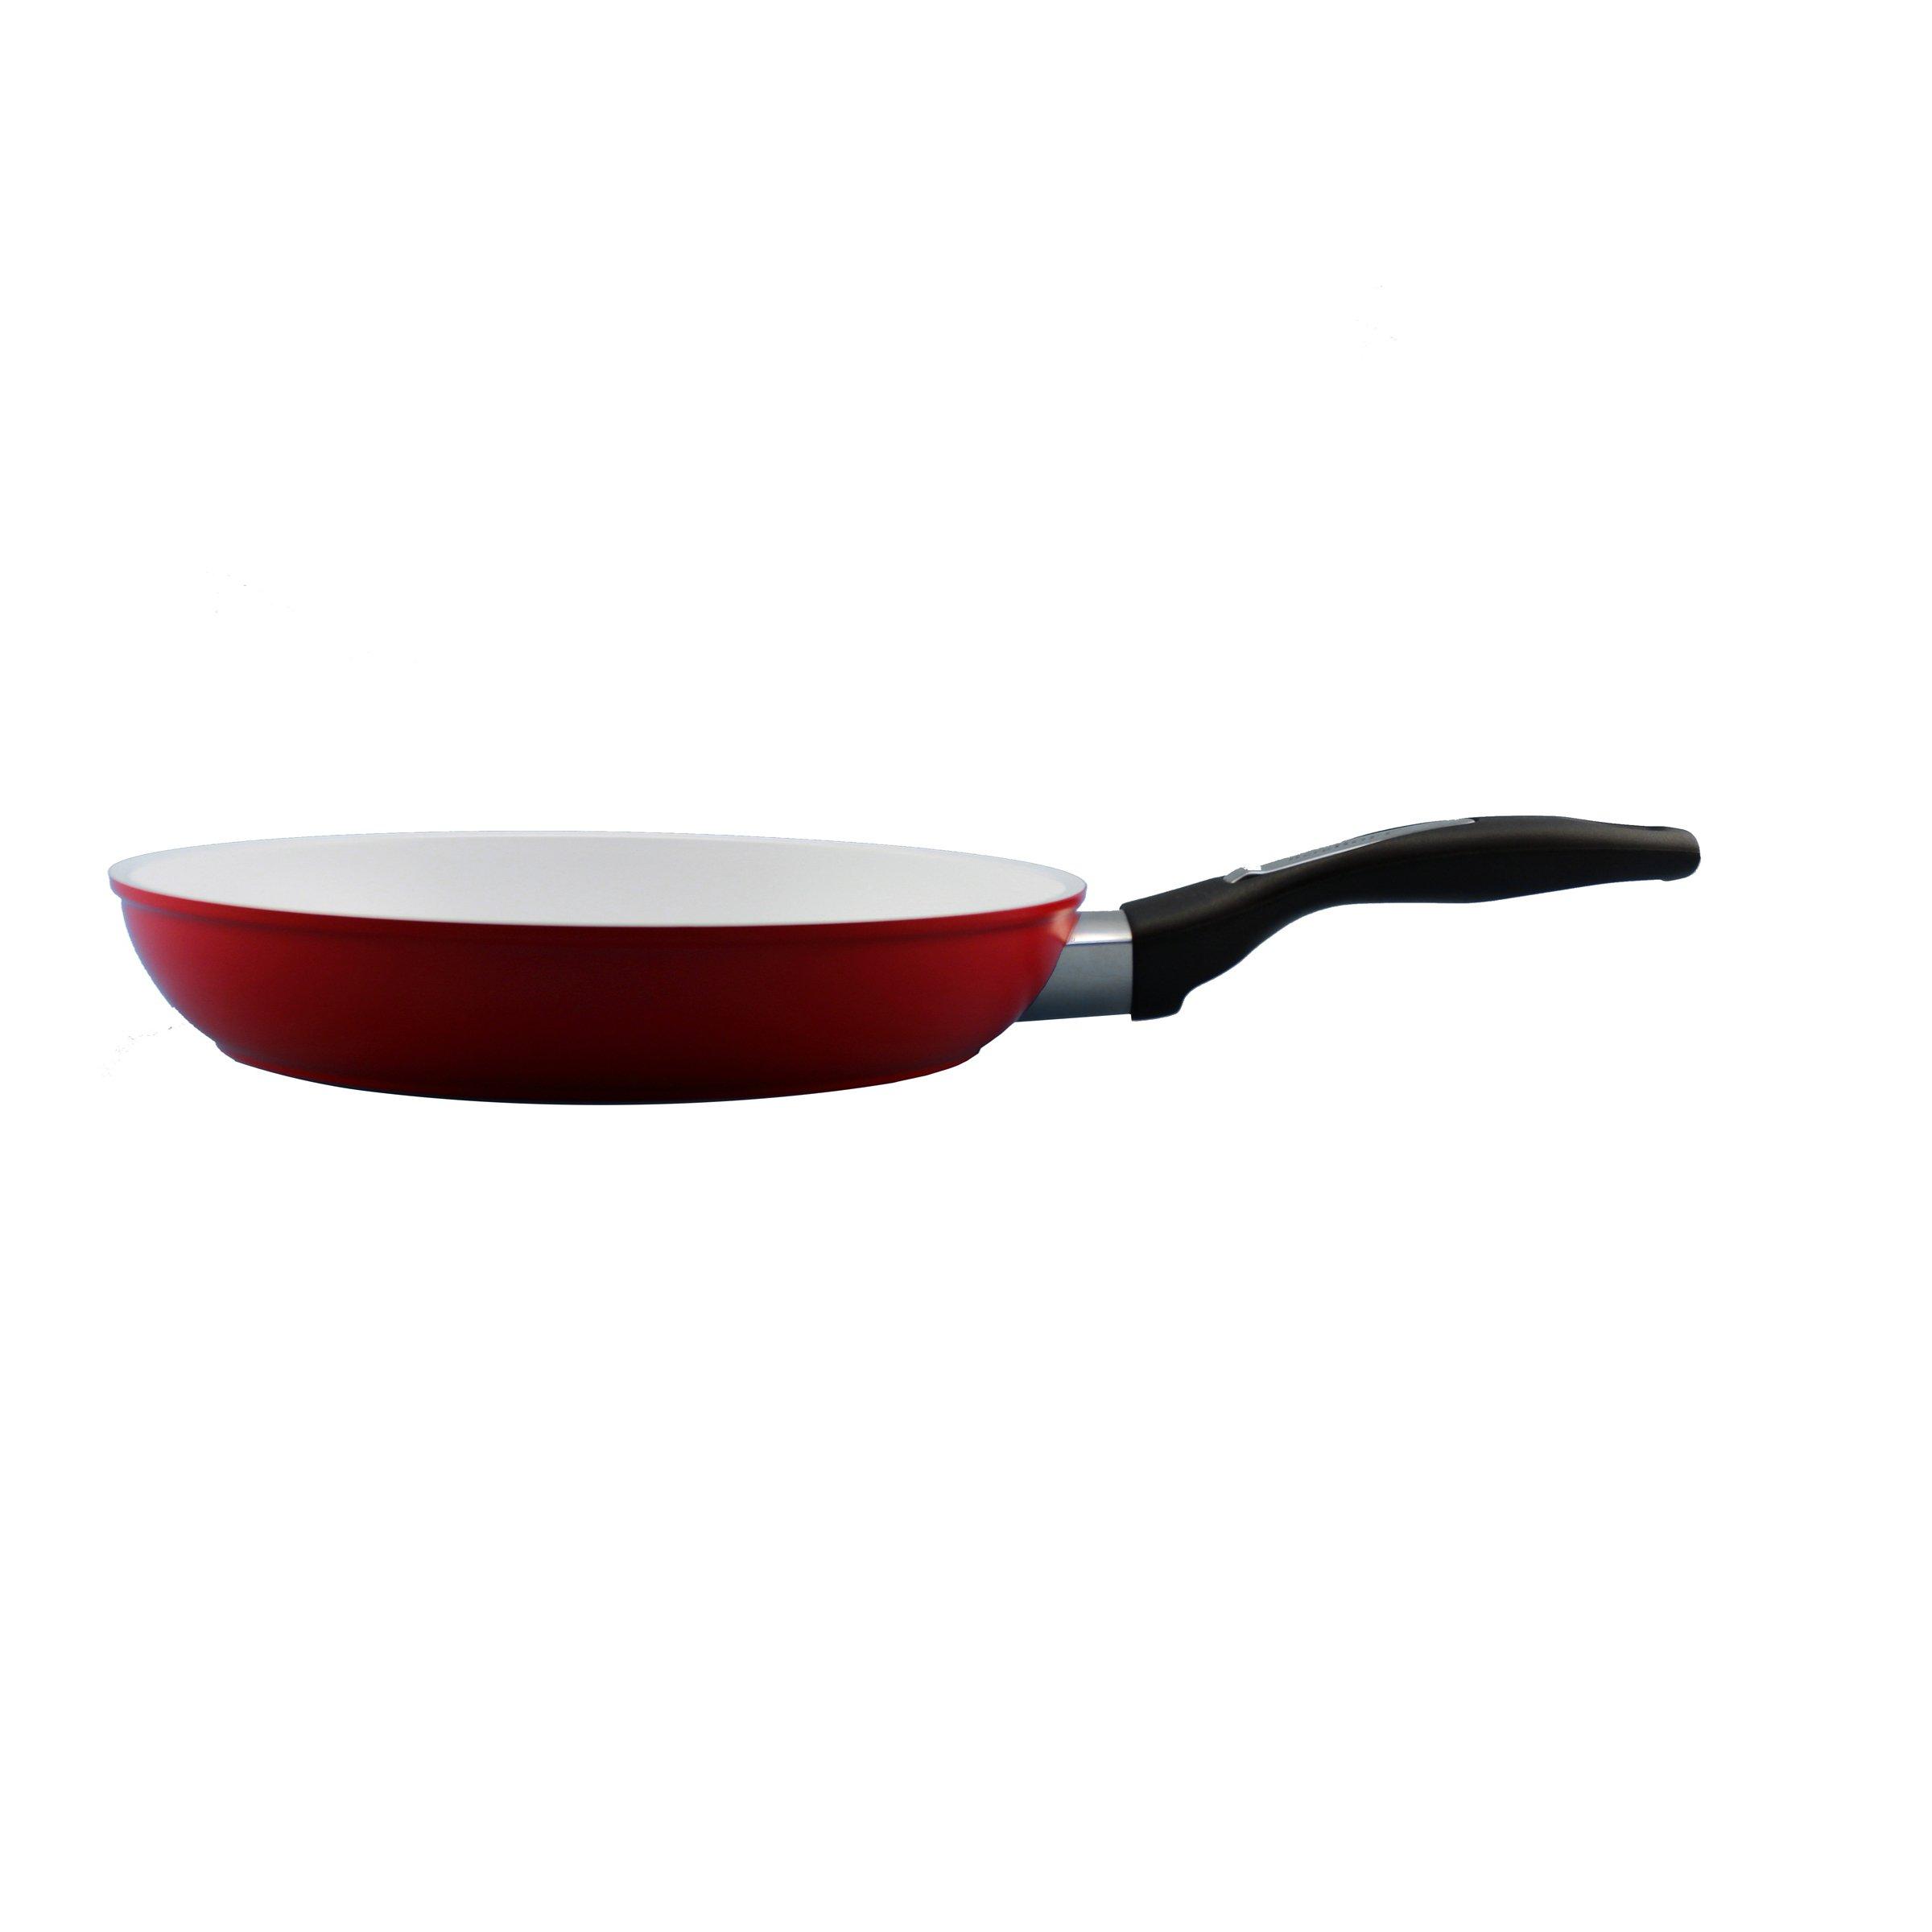 BergHOFF Fry Pan ceramic Non-Stick 11'' Red, Large